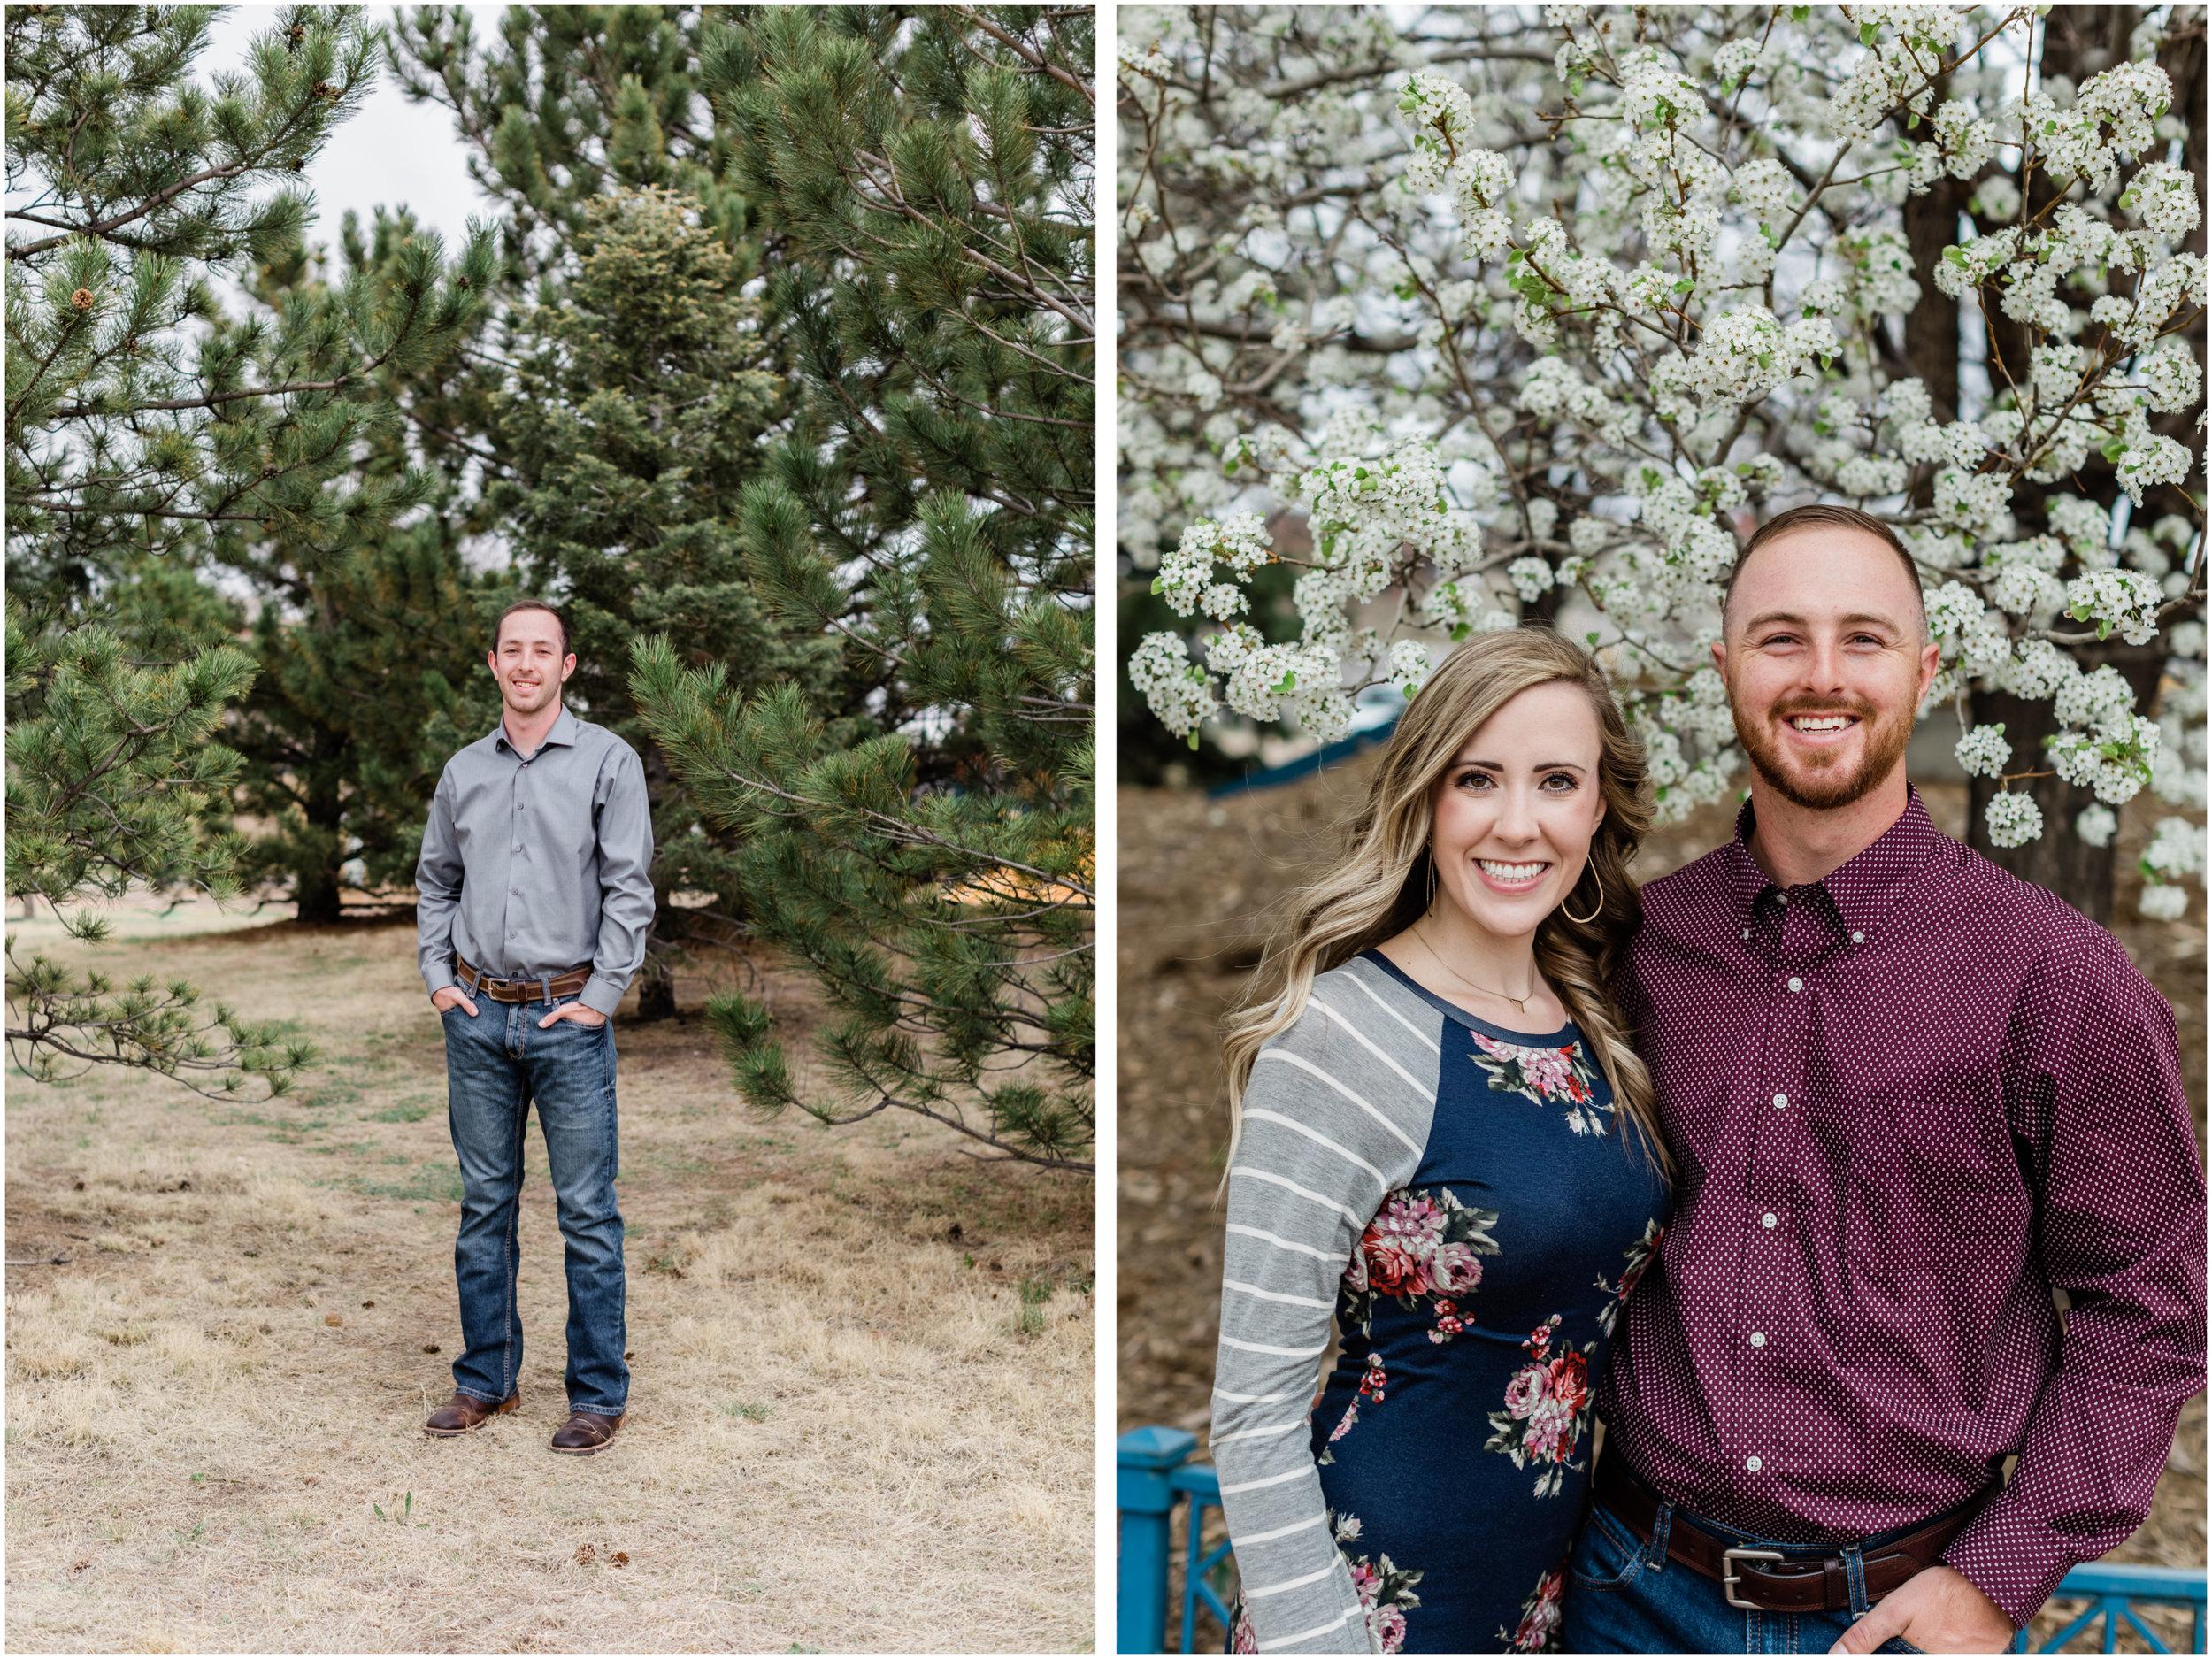 Colorado Springs Family Photographer 6.jpg